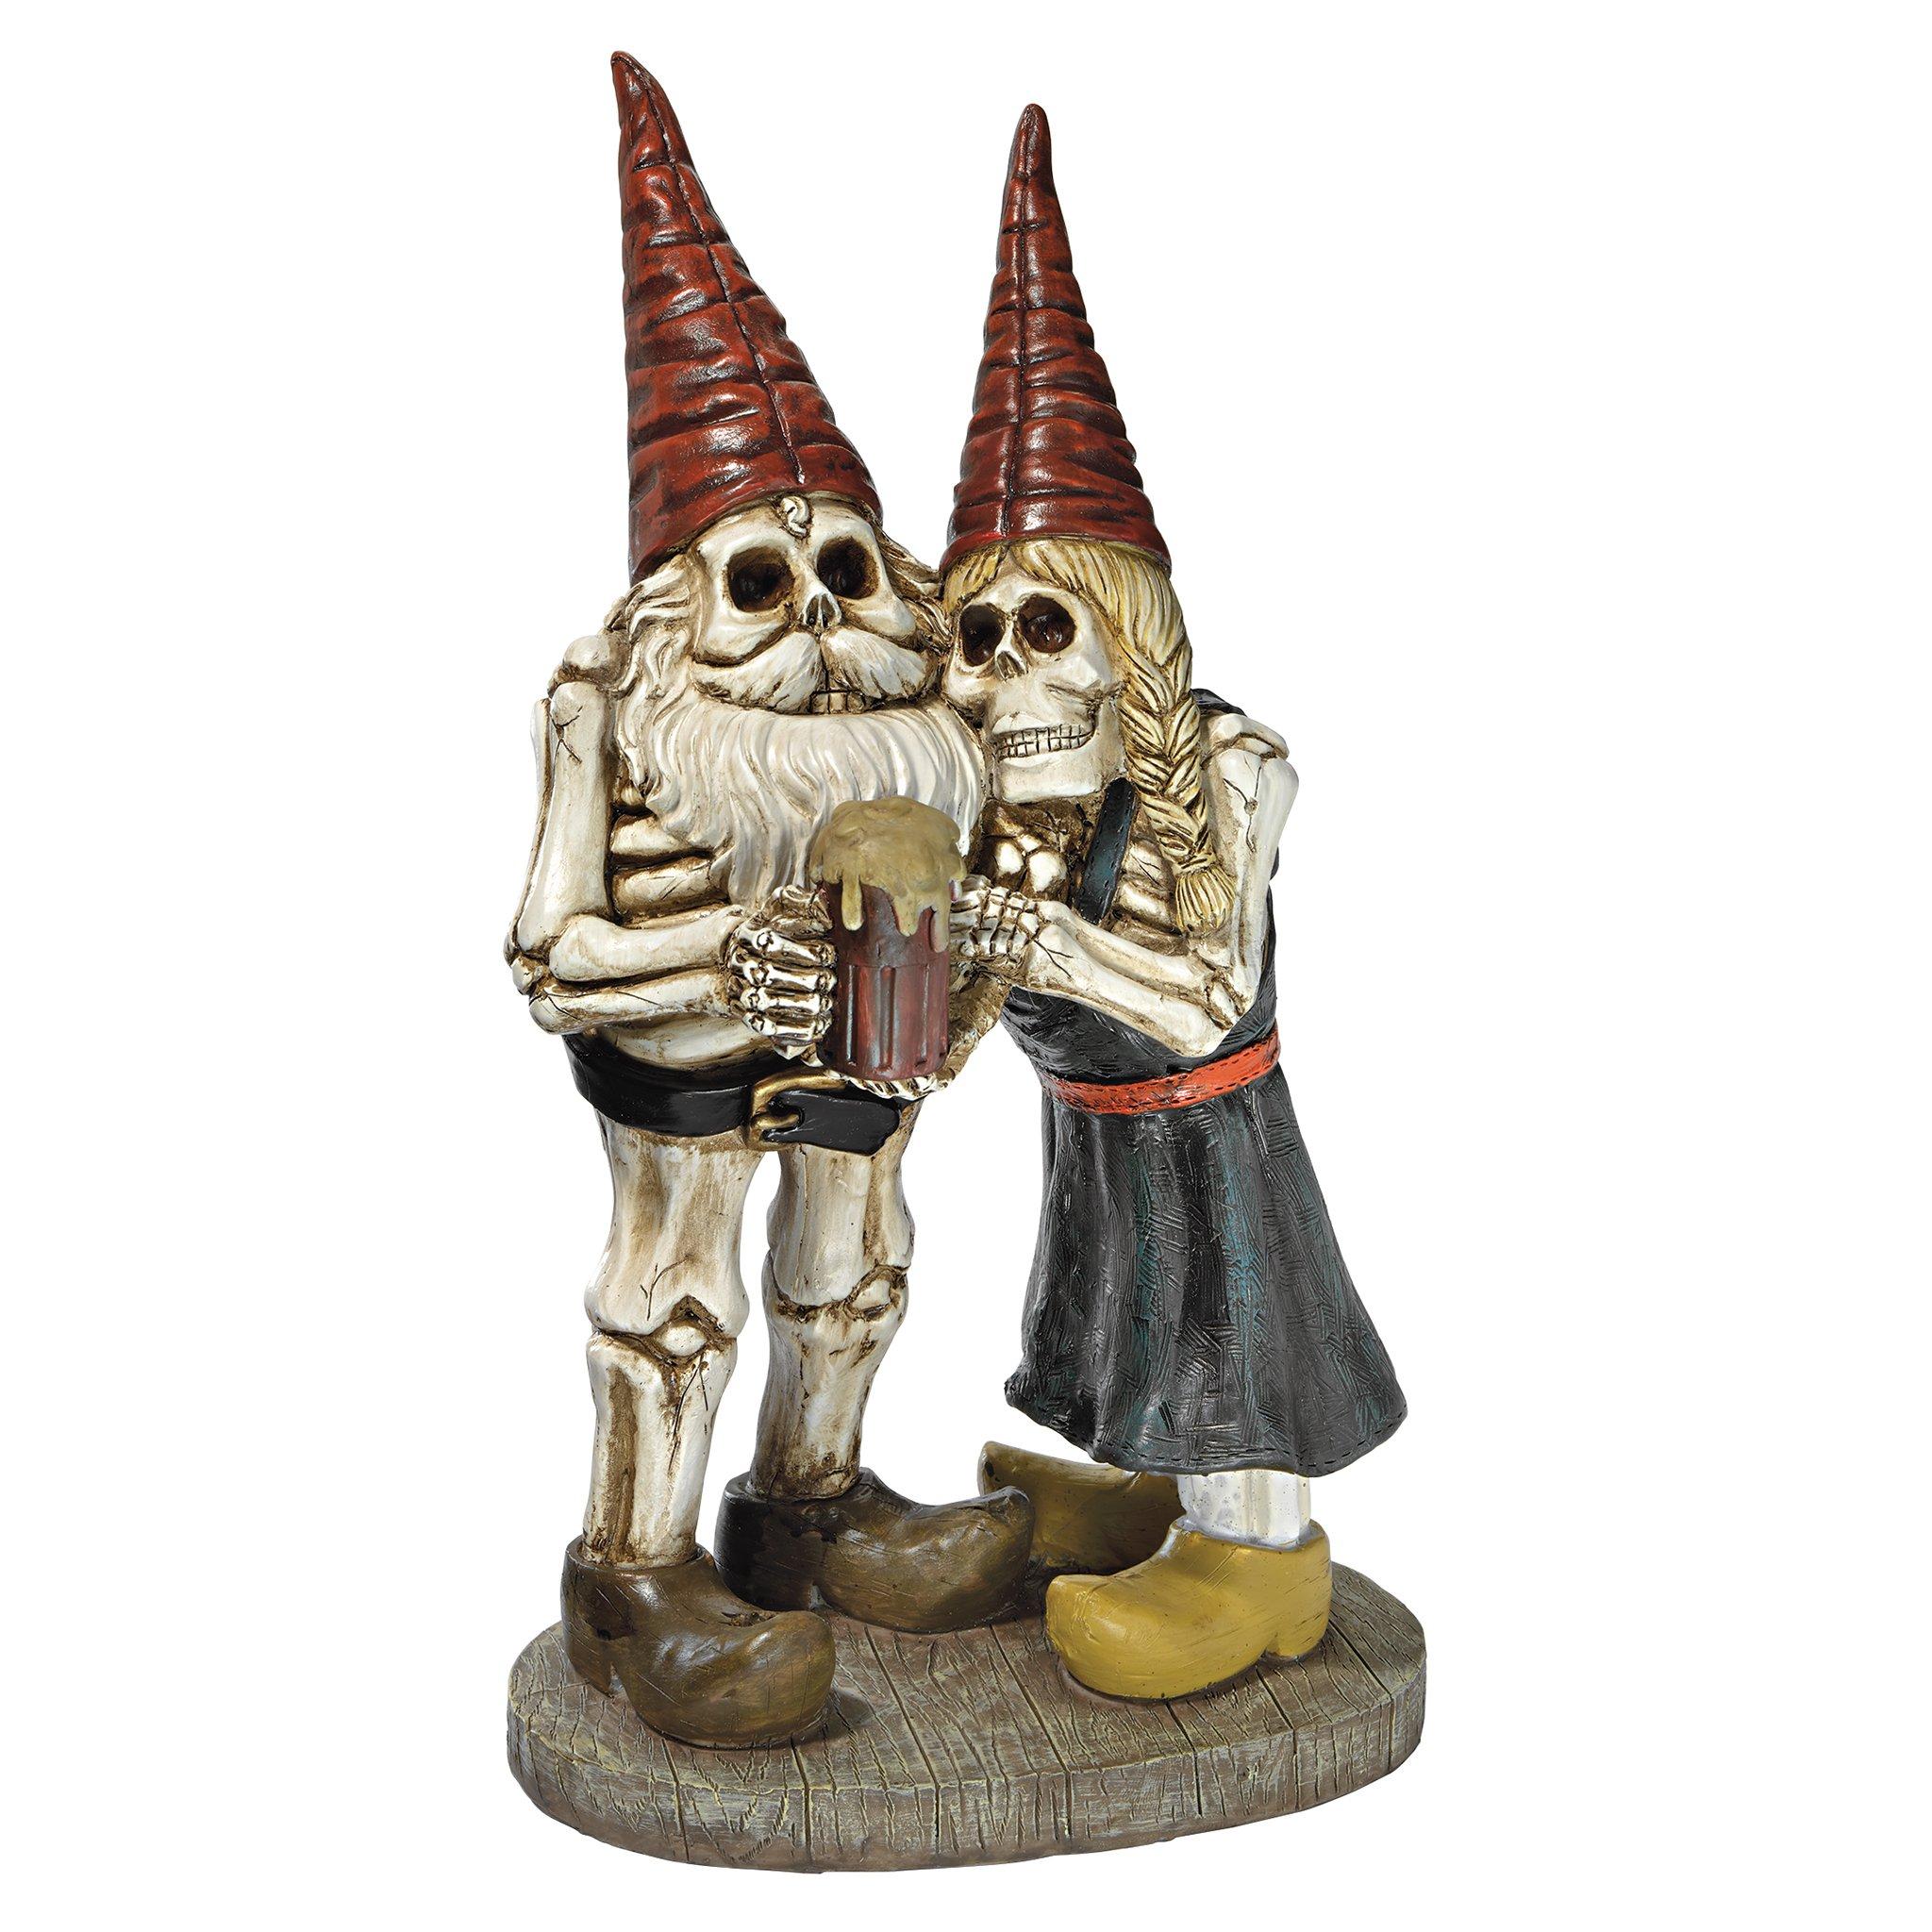 Design Toscano QM14018 Zombie Gnome - Bones and Brew Skeleton Graveyard Gnomes - Garden Gnome Statue,full color